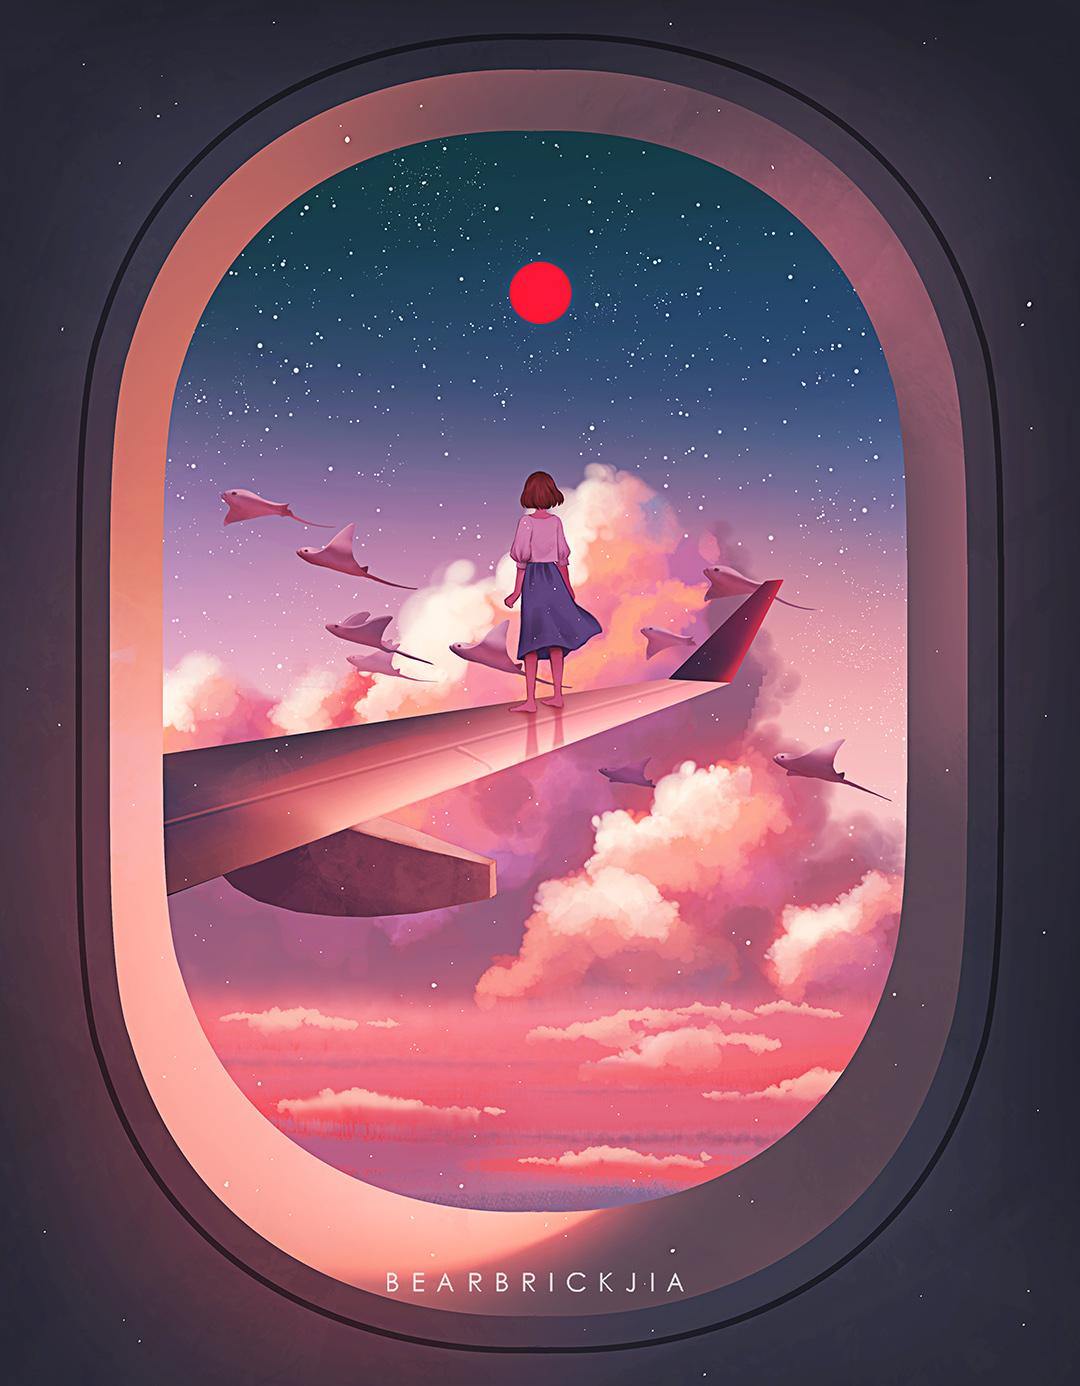 GirlsclubAsia-Artist-Illustrator-Karmen Loh-FollowTheStingrays